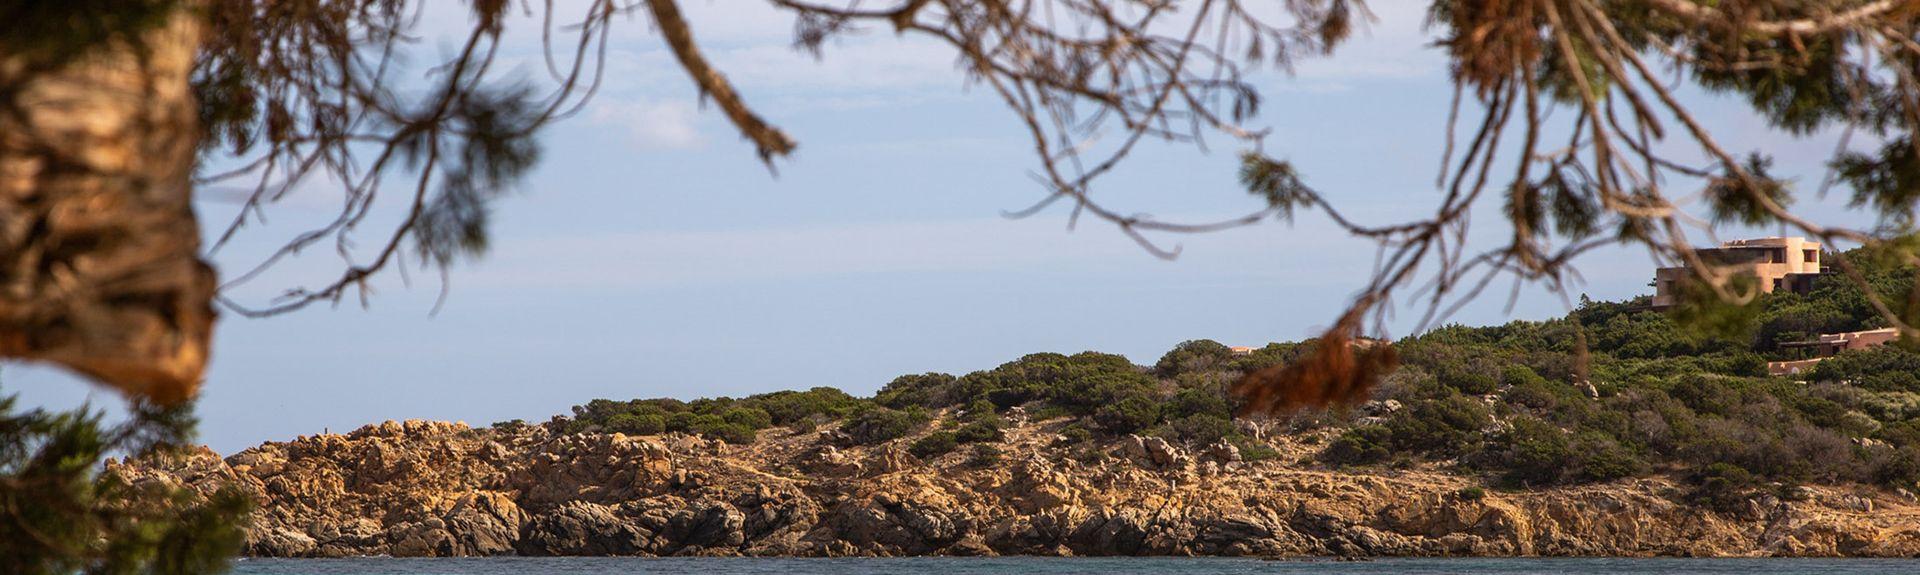 Punta Sardegna, Sassari, Sardinia, Italy